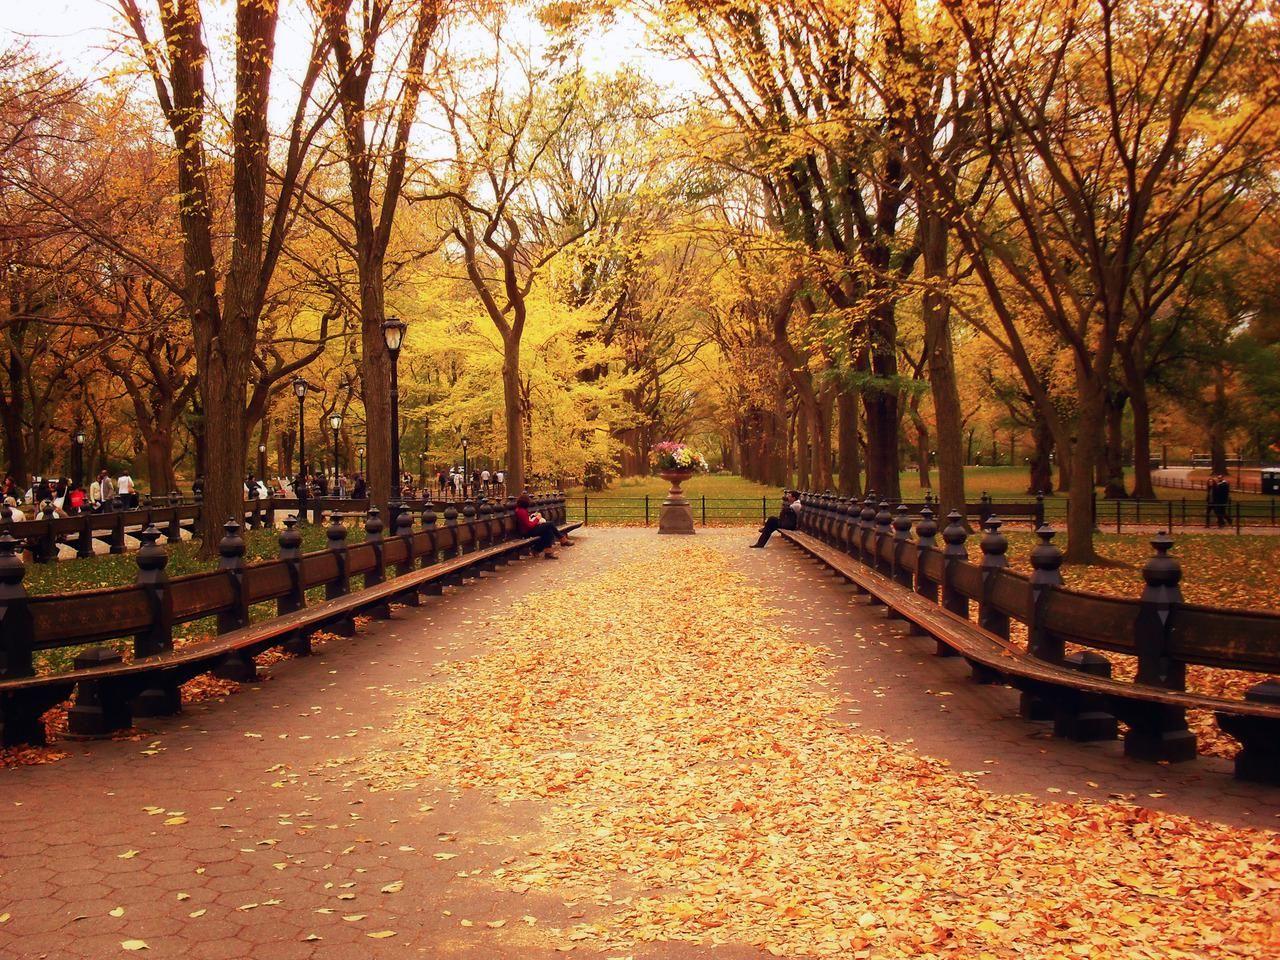 autumn_in_central_park_new_york_city_new_york-1578764